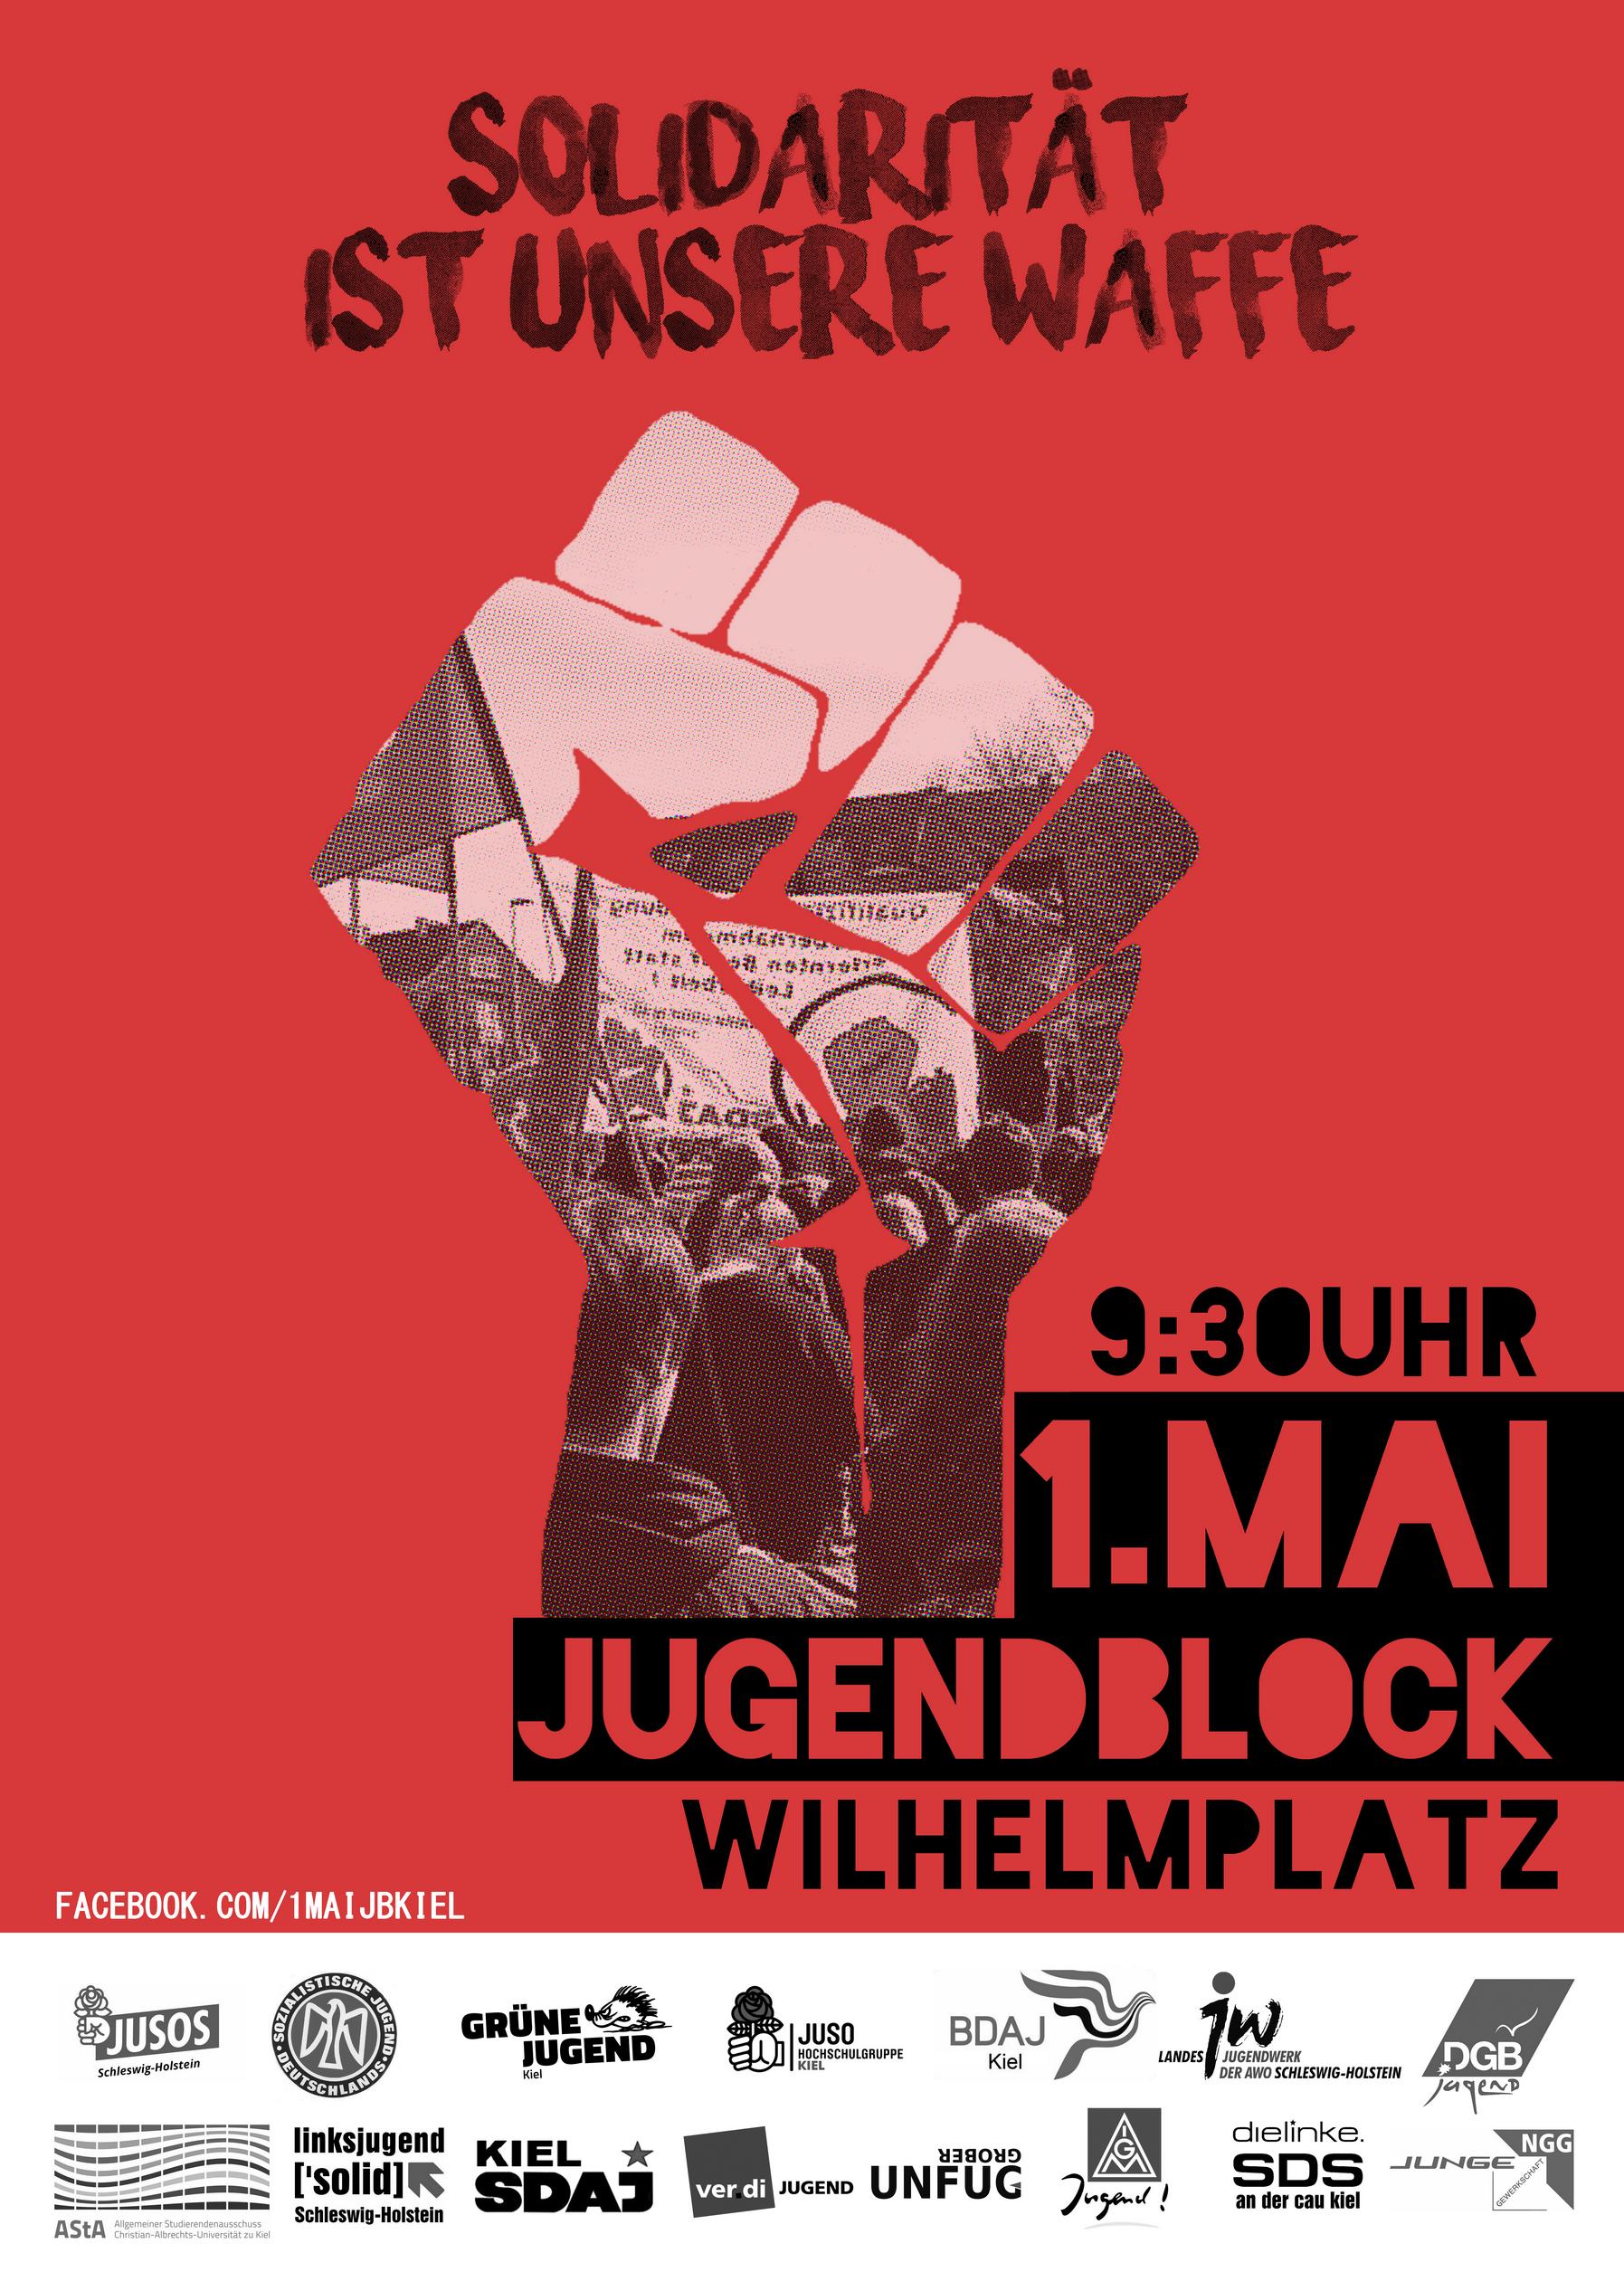 1. Mai Demoaufruf - Solidarität ist unsere Waffe